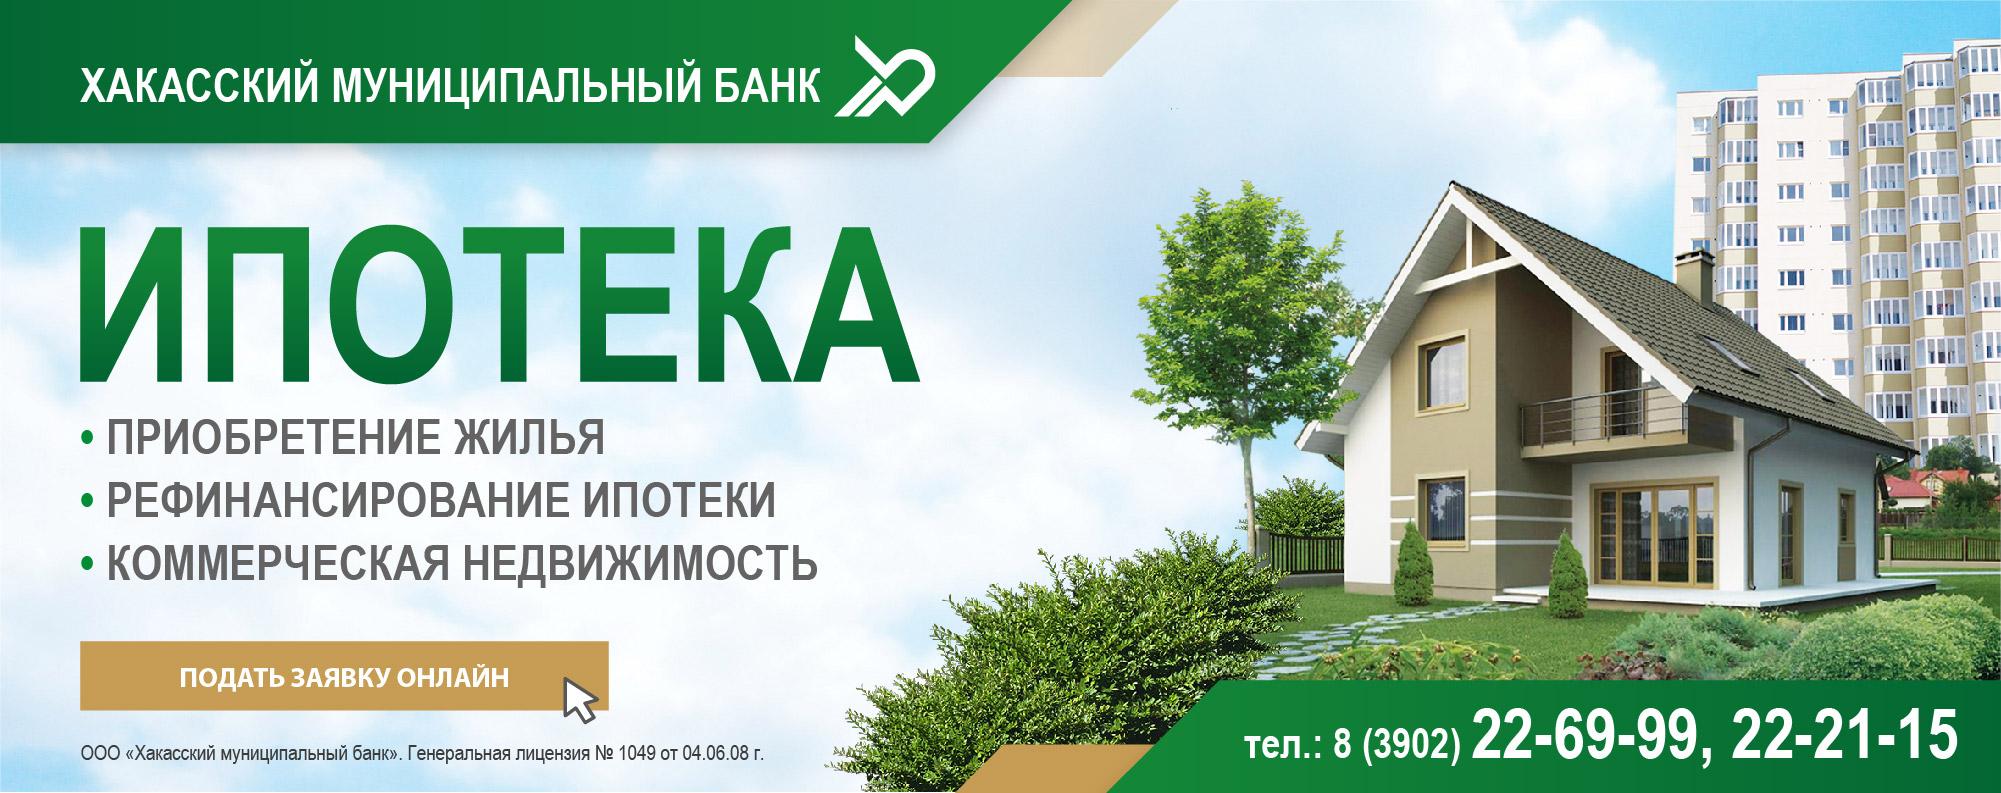 Эйфоретик Телеграм Абакан Наркотик Интернет Домодедово